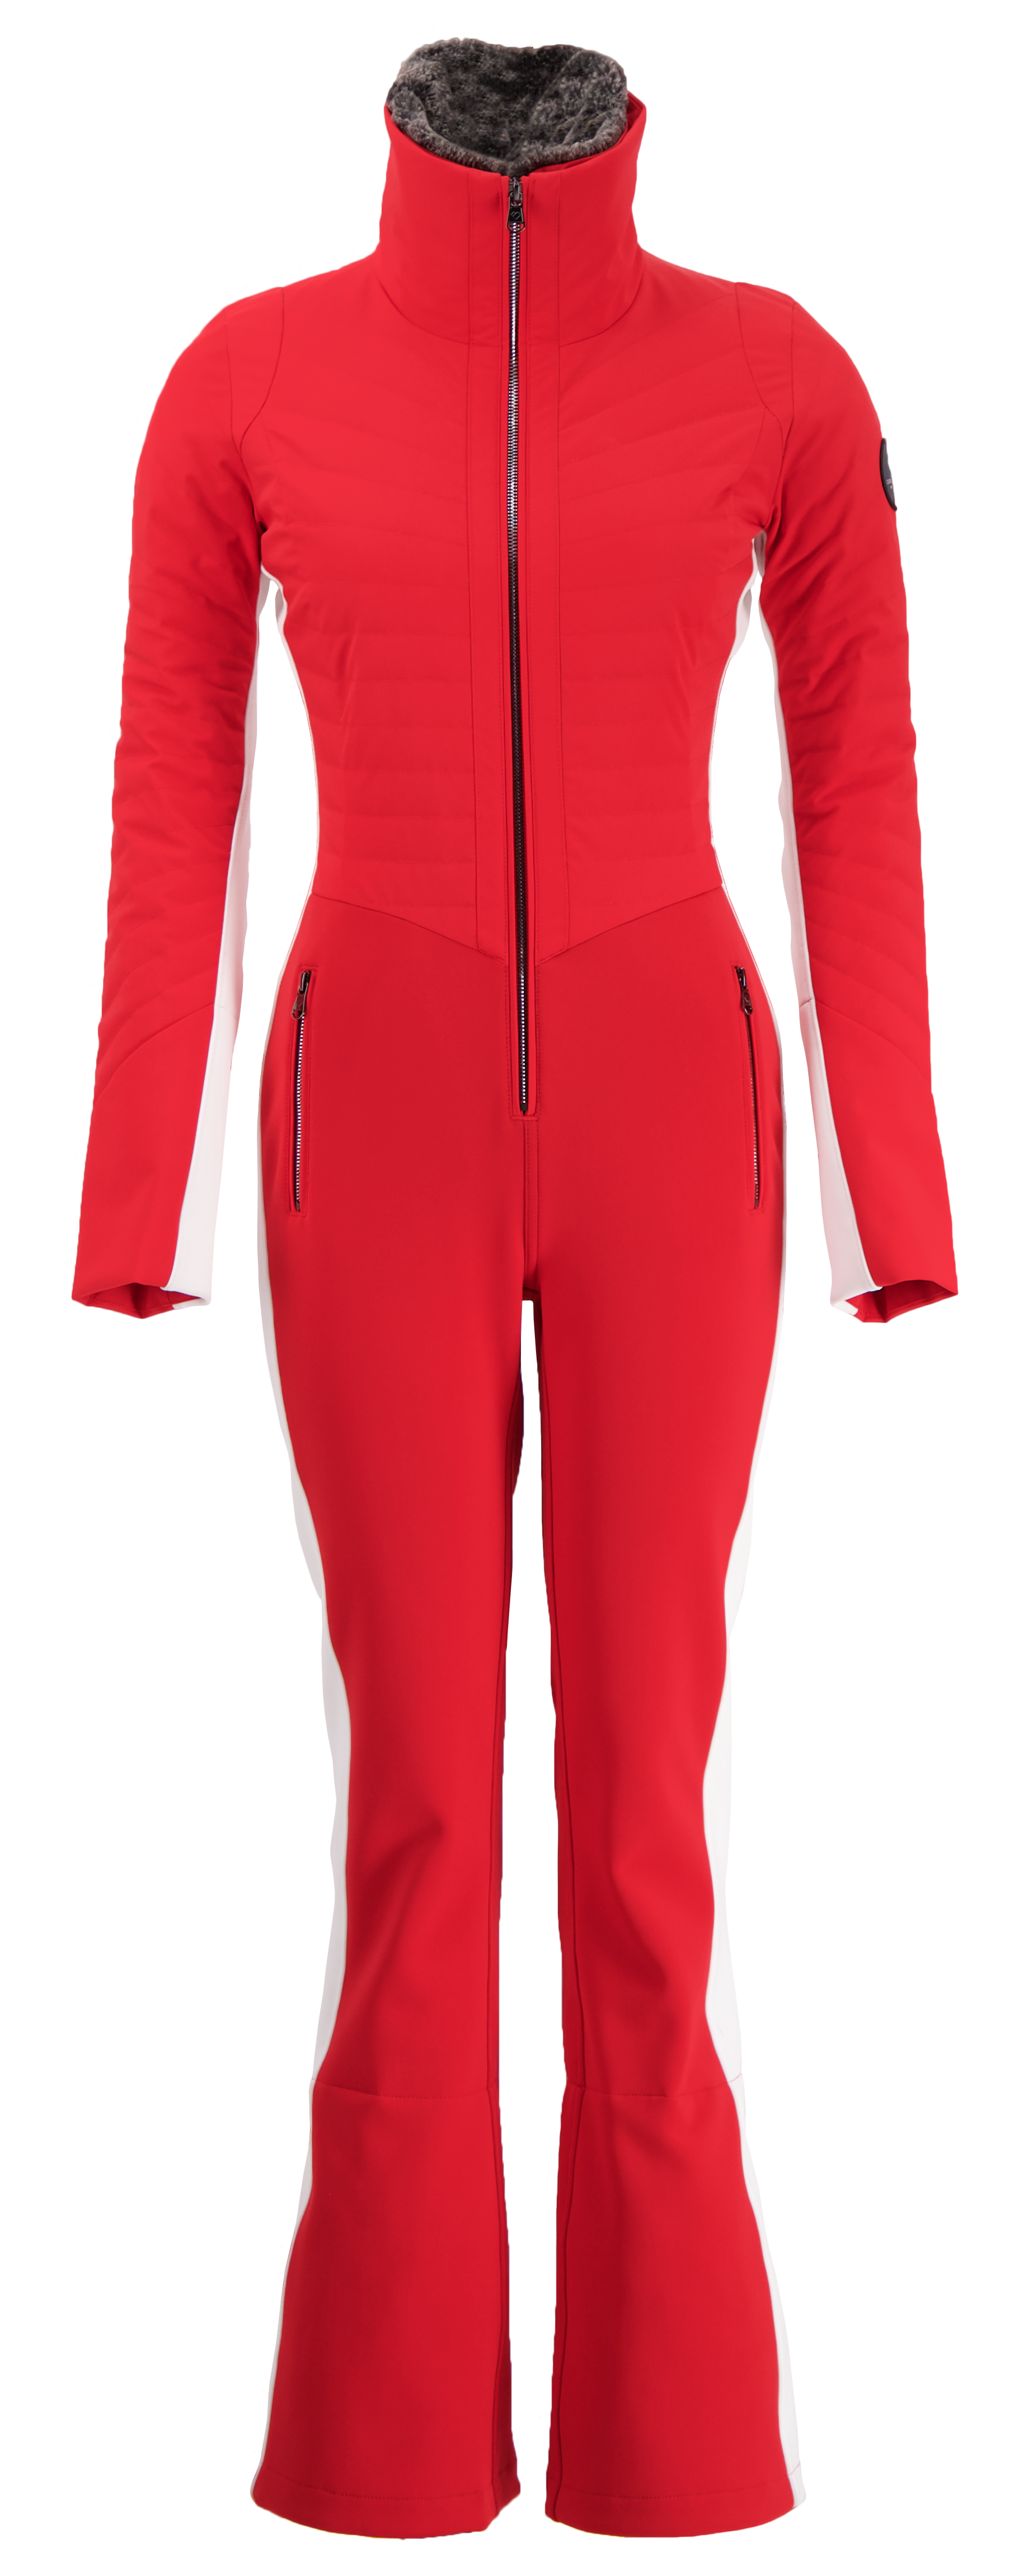 Spyder Arc Tech Softshell Jacket